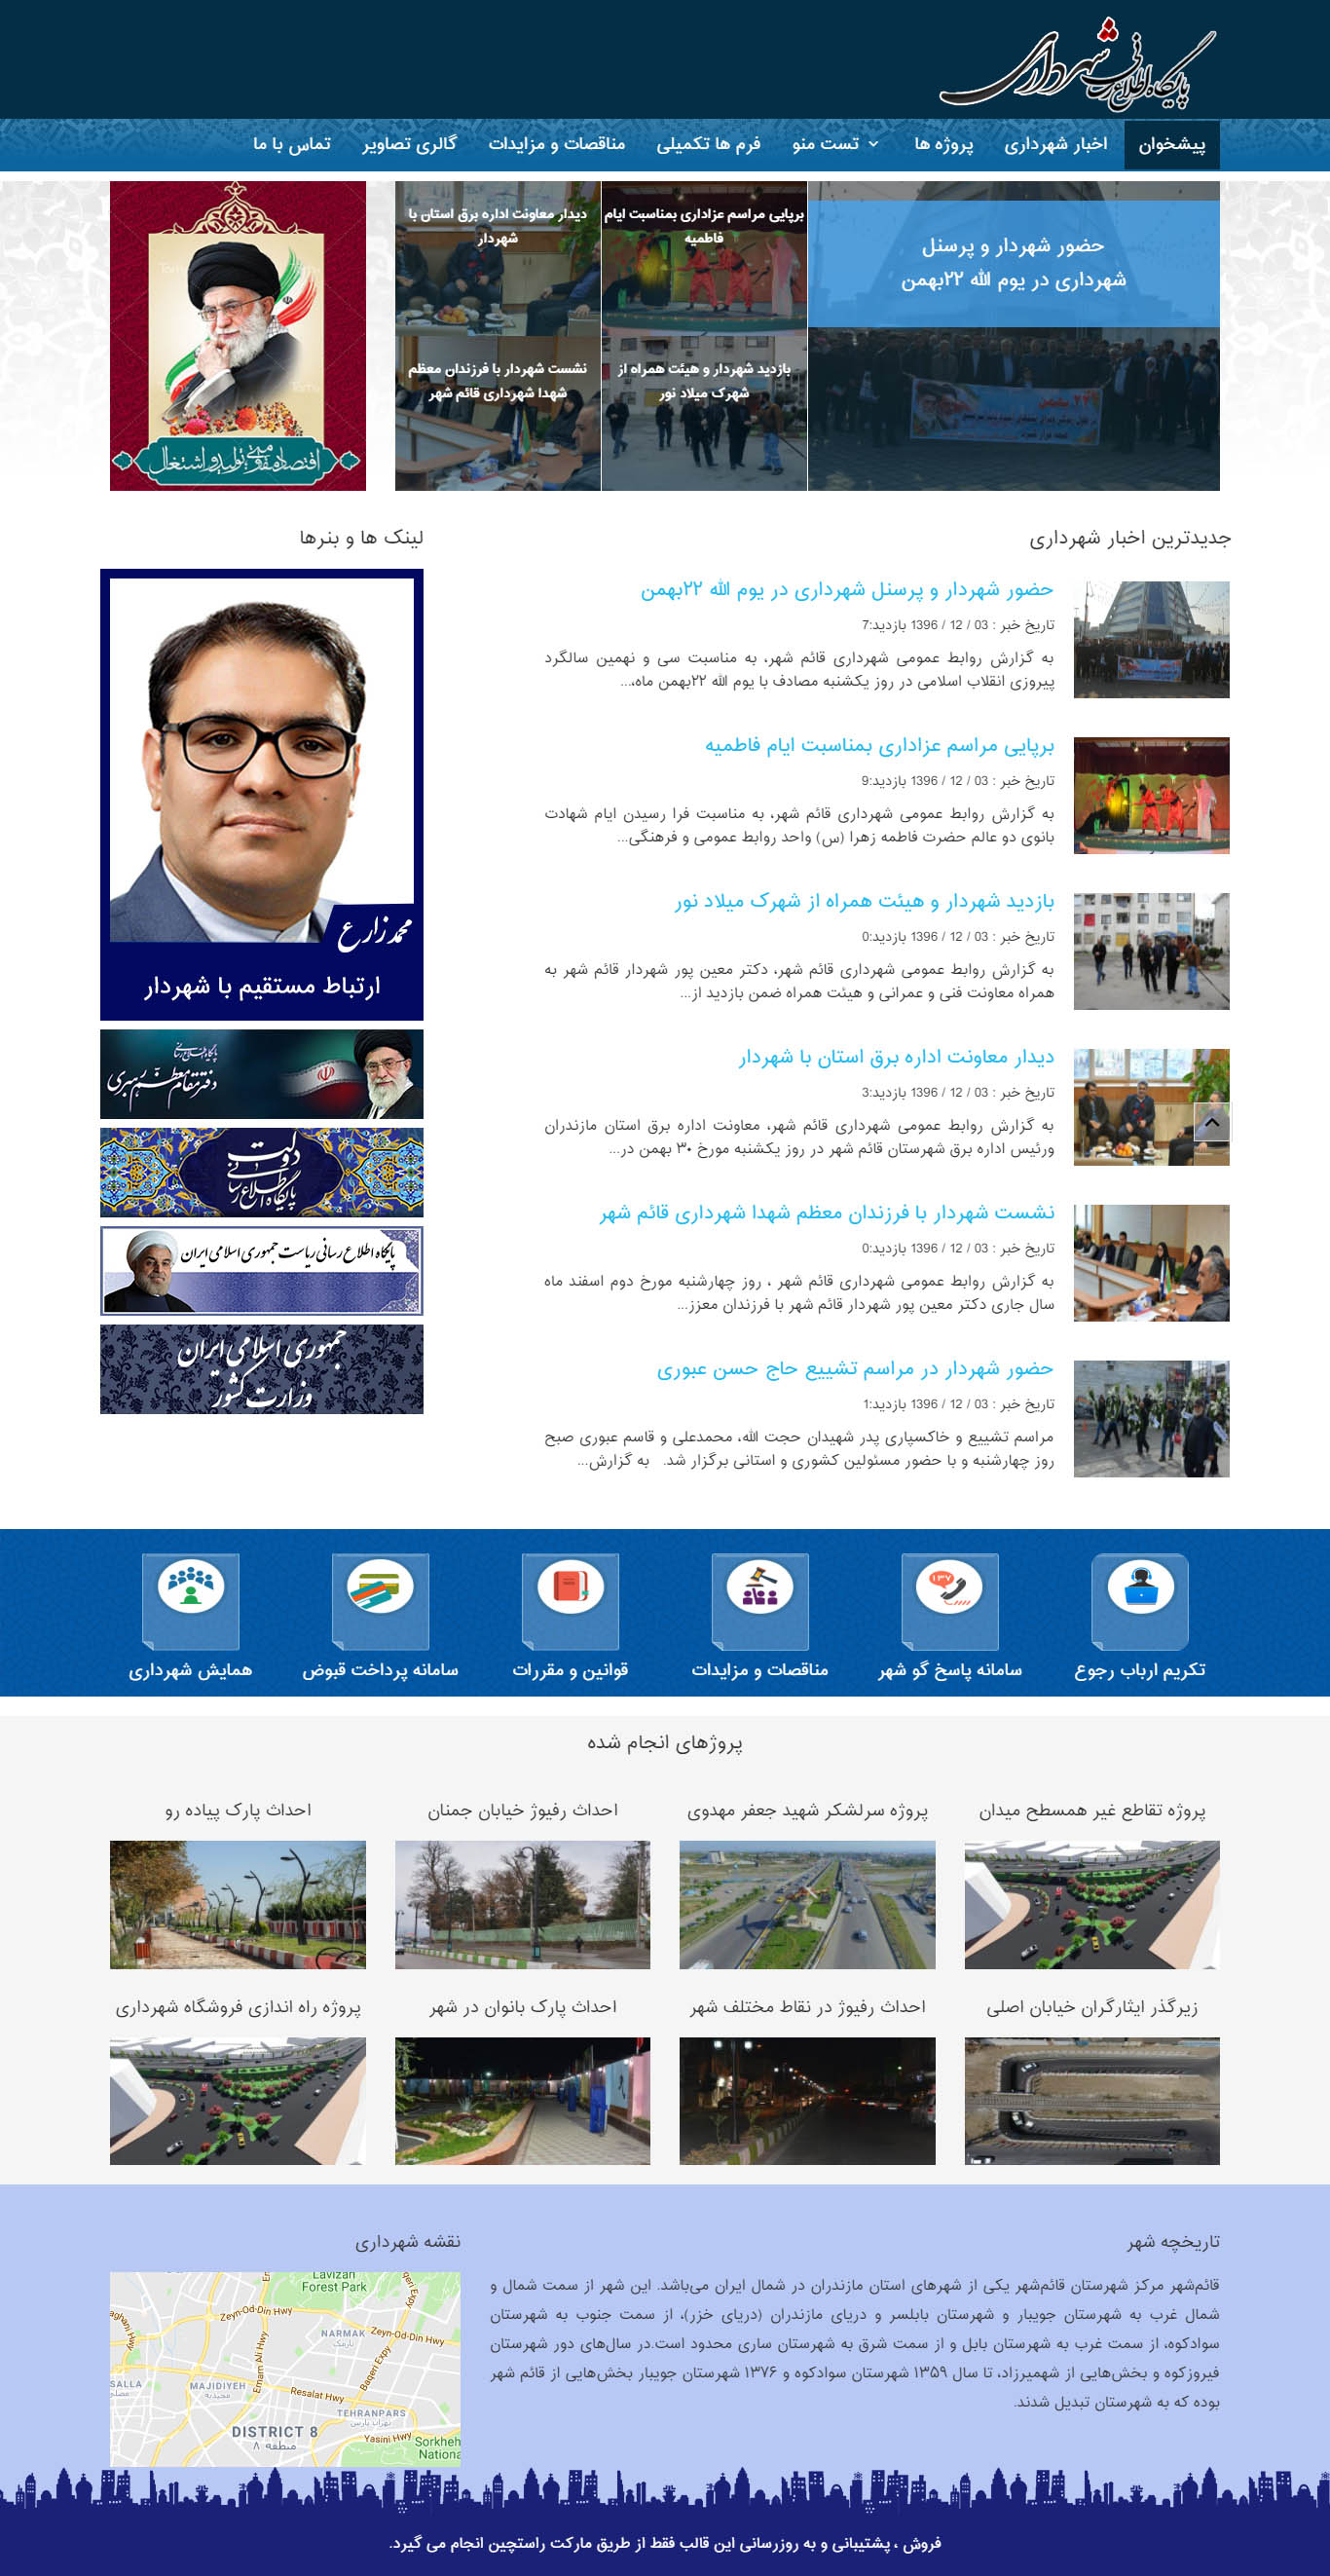 16126 f4f20997ba01976f740ee20f1 - قالب اداری جوملا شهرداری | shahrdari